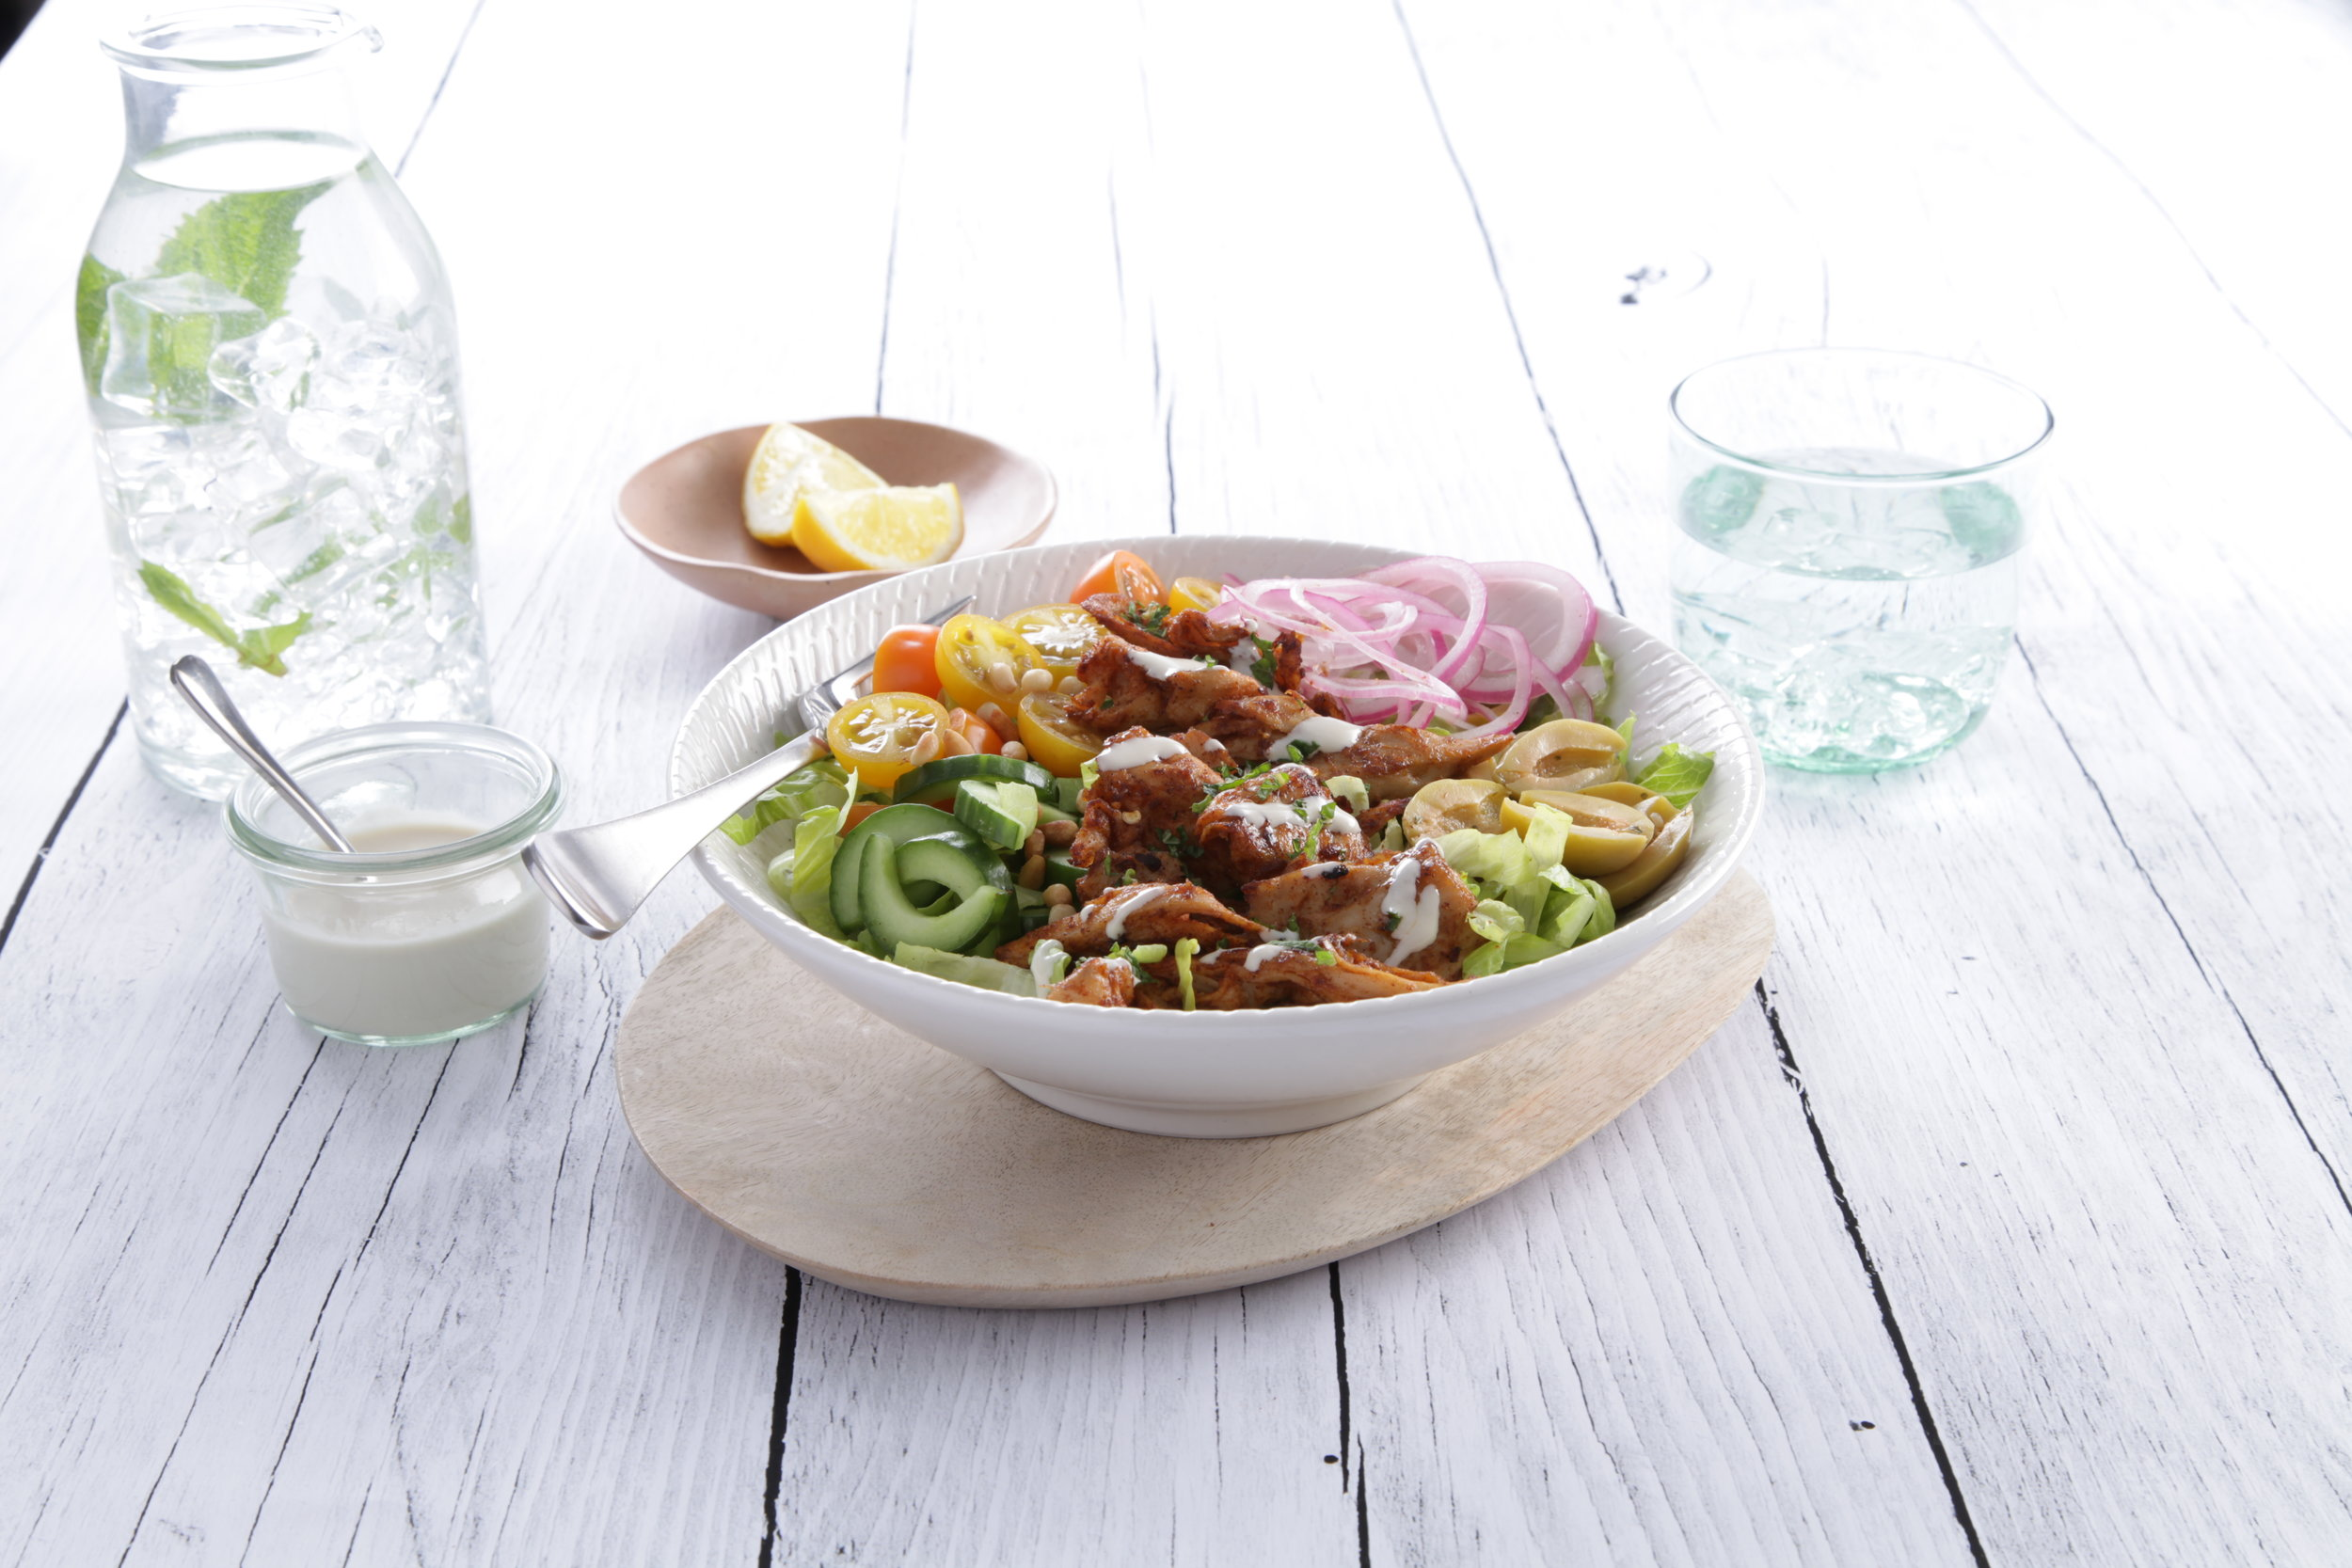 Simplot Australia's 100% Not Chicken Vegan Tahini Bowl